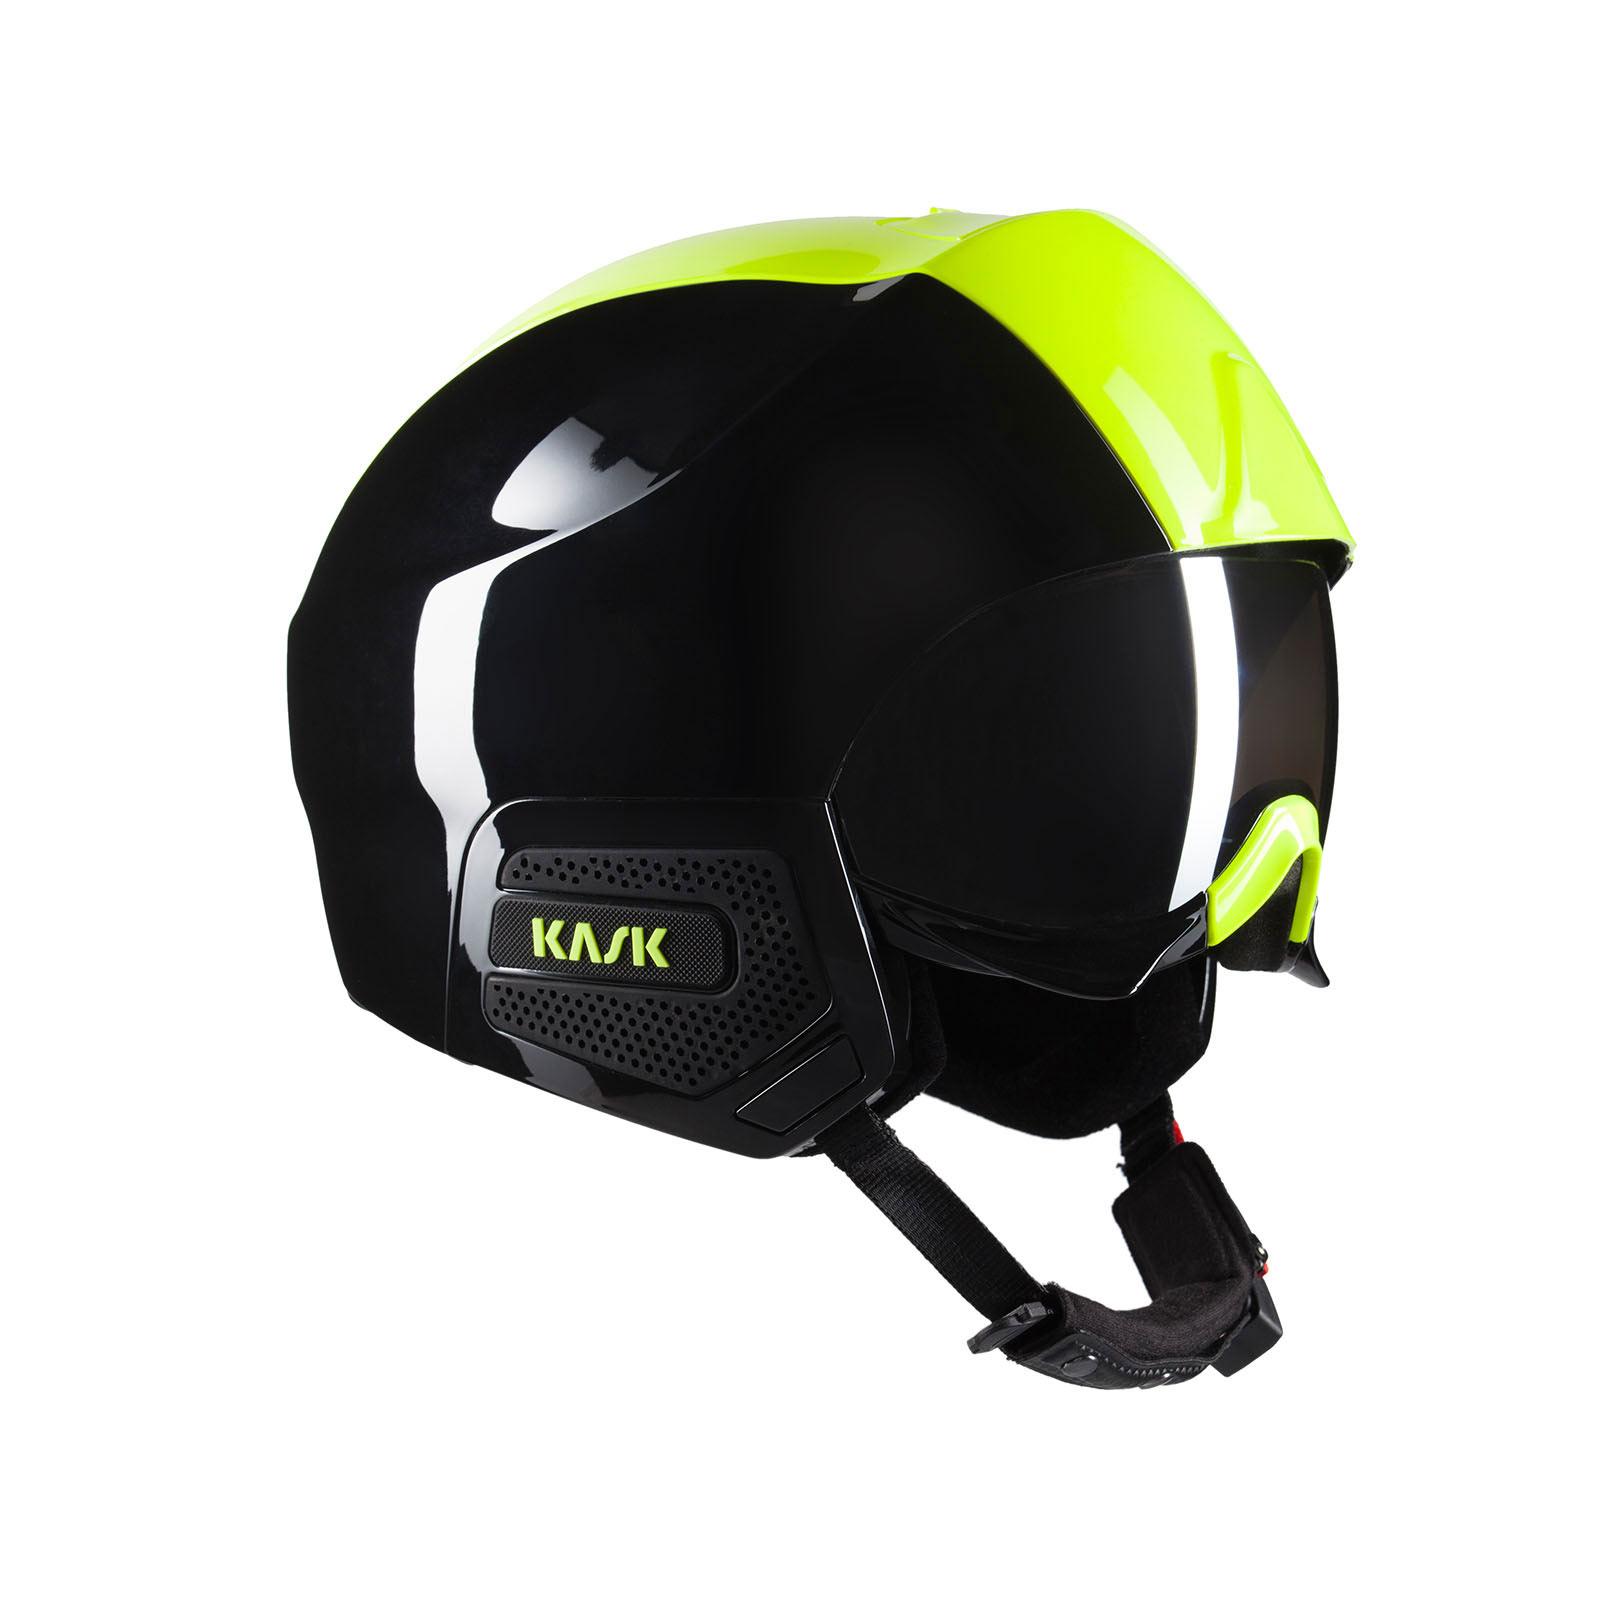 KASKのバイザー付きスキーヘルメットSTEALTH